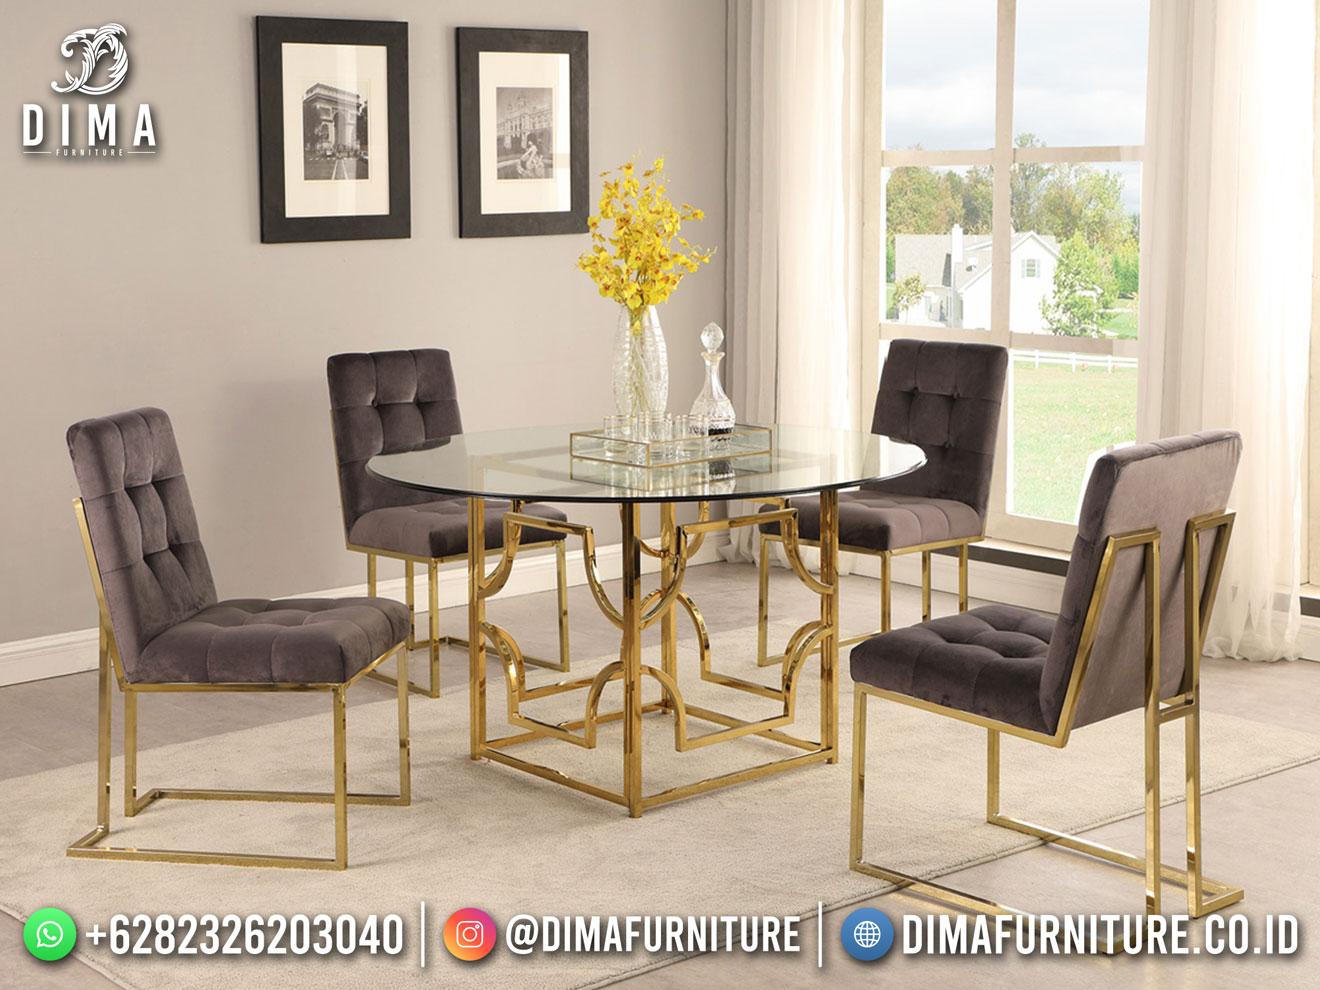 Beauty Gray Meja Makan Minimalis Industrial Furniture DF-1682